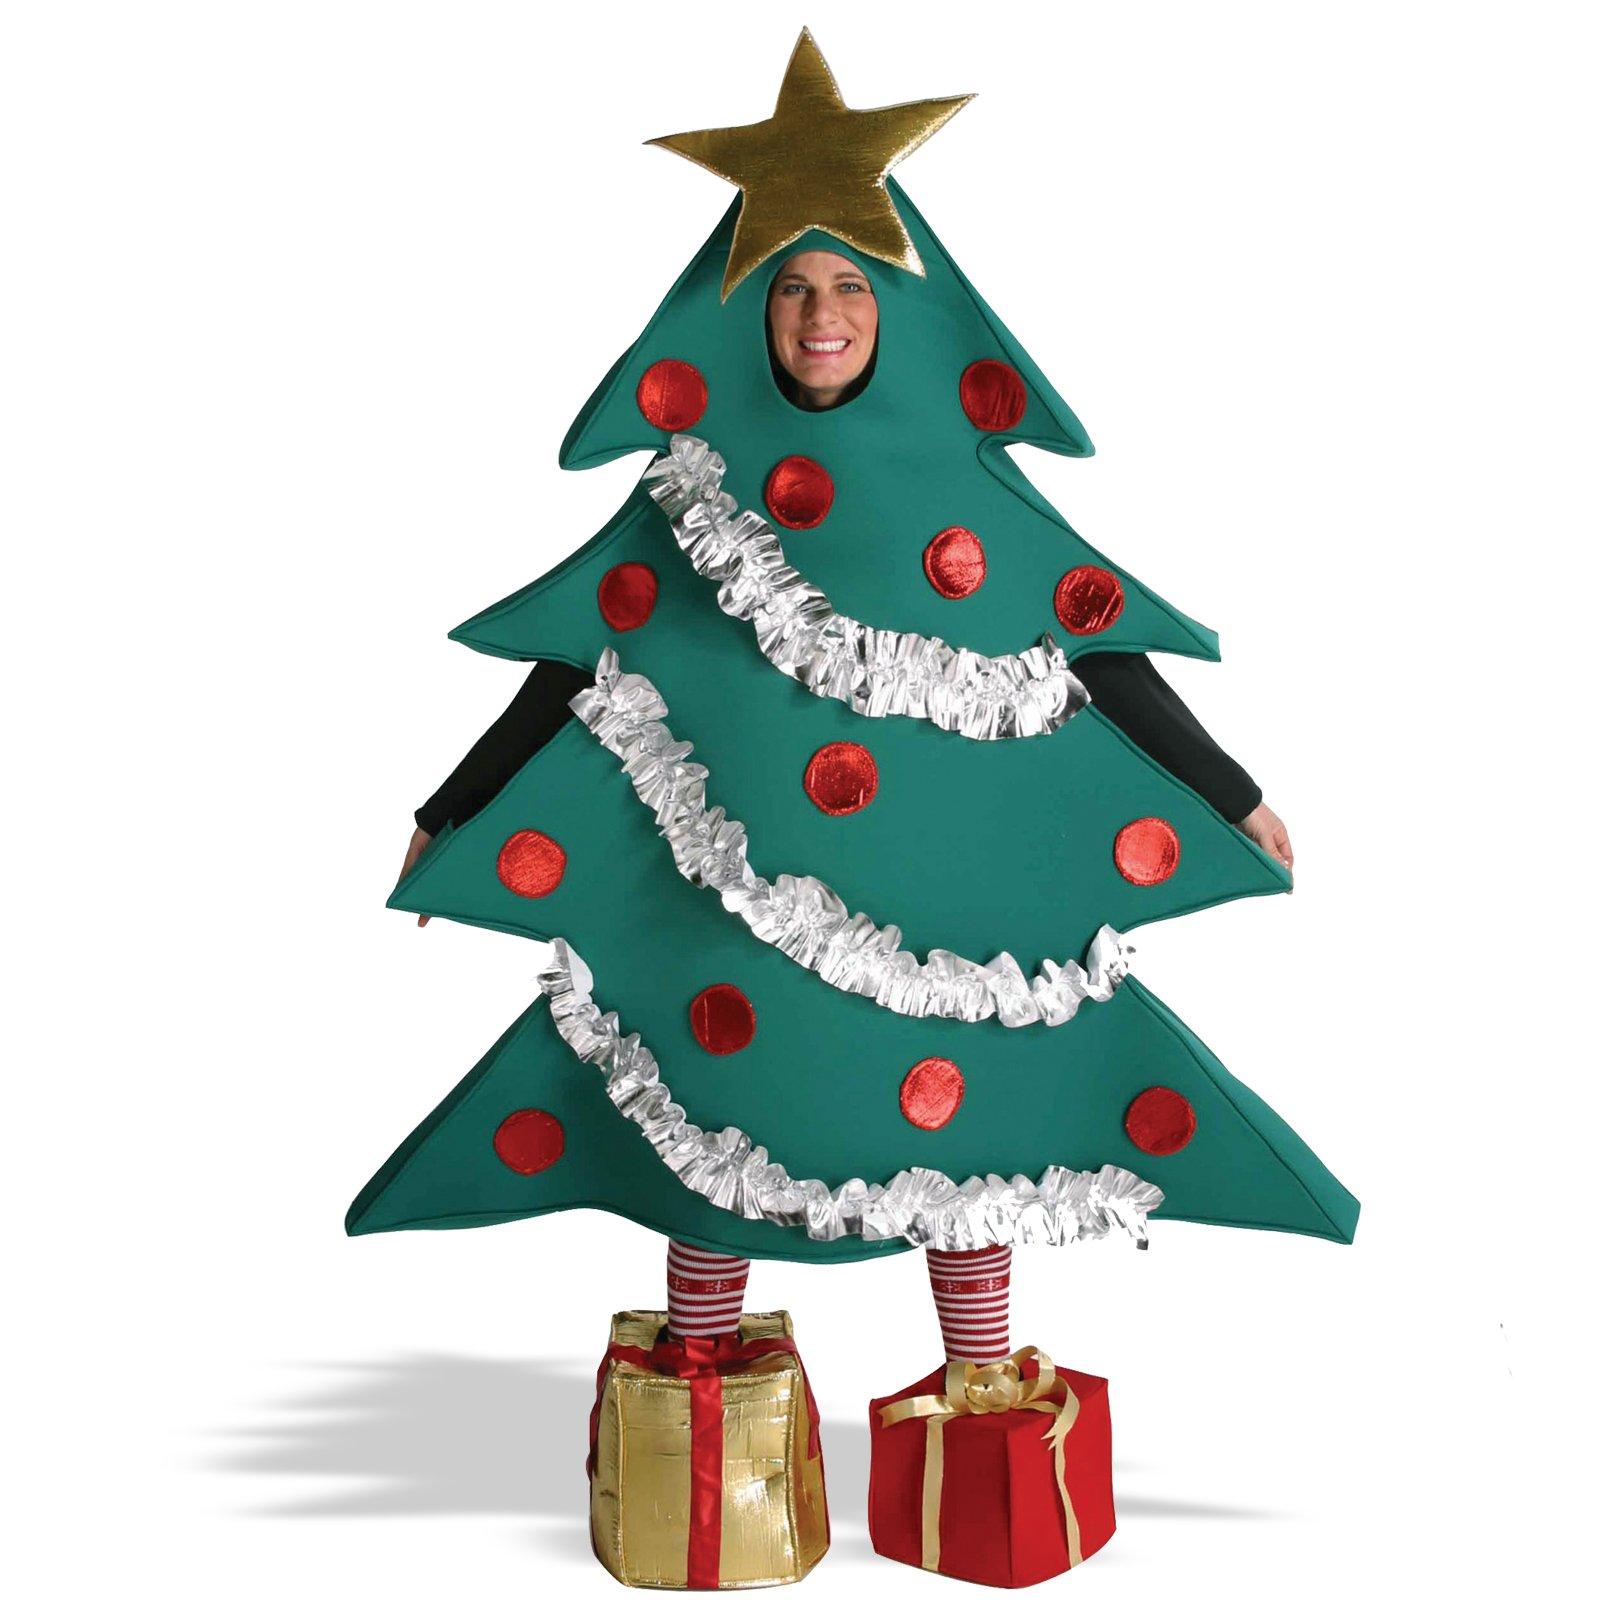 Christmas Tree Dress Costume: Mighty Lists: 12 People Dressed As Christmas Trees